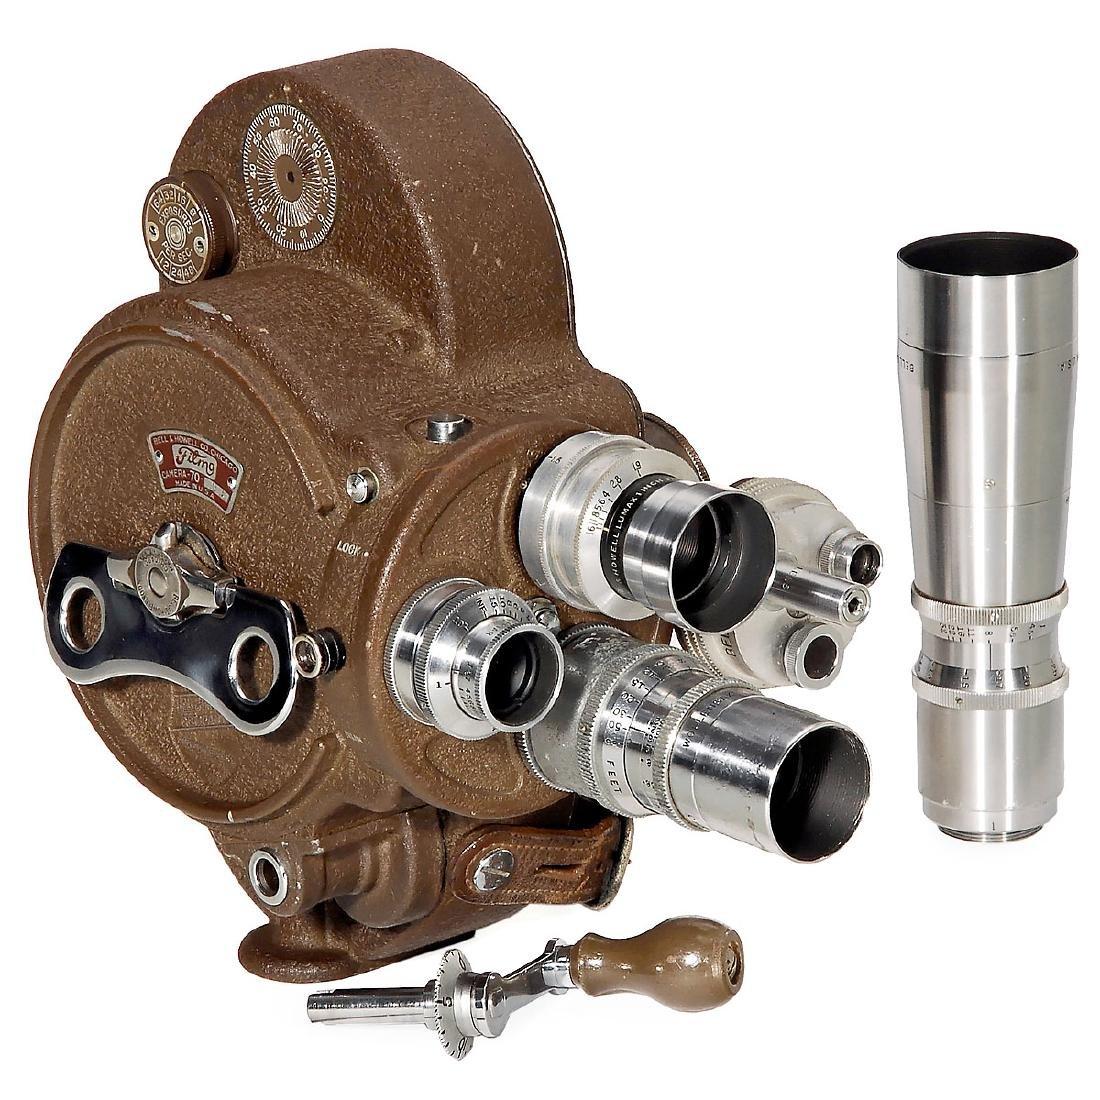 Bell & Howell Filmo 70DA 16mm Movie Camera, c. 1950